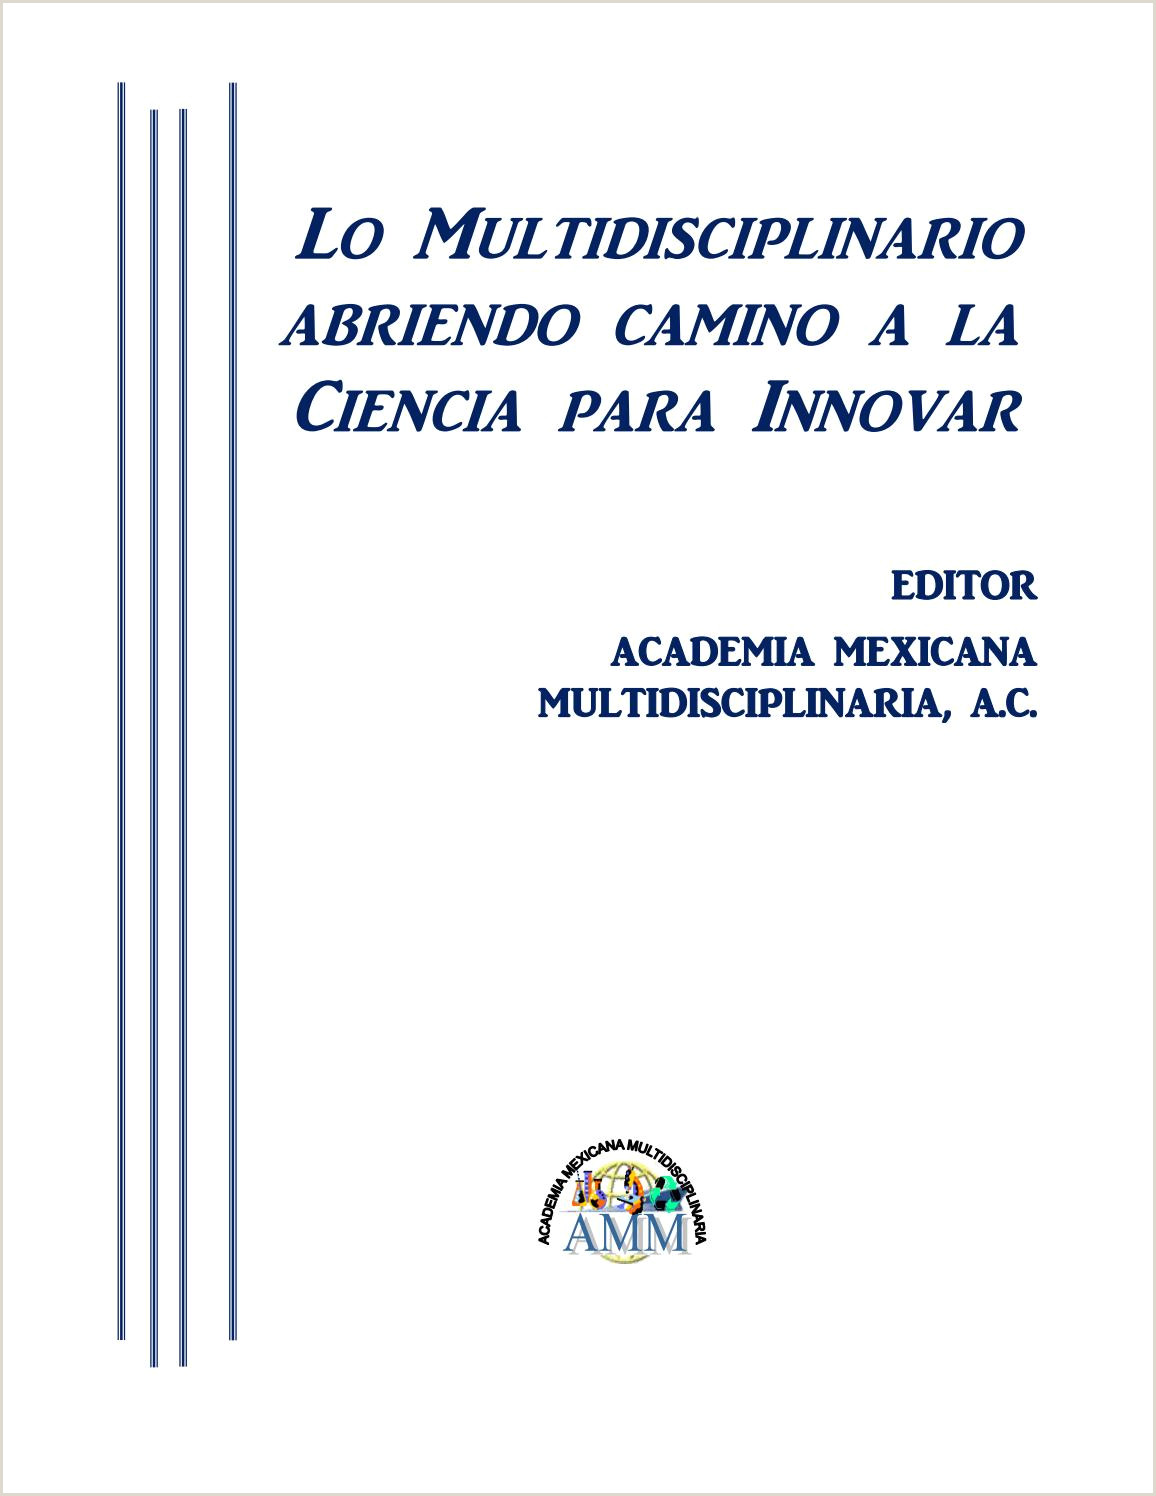 Formato Hoja De Vida Giz Libro 2017 Amm by Academiamexmulti issuu